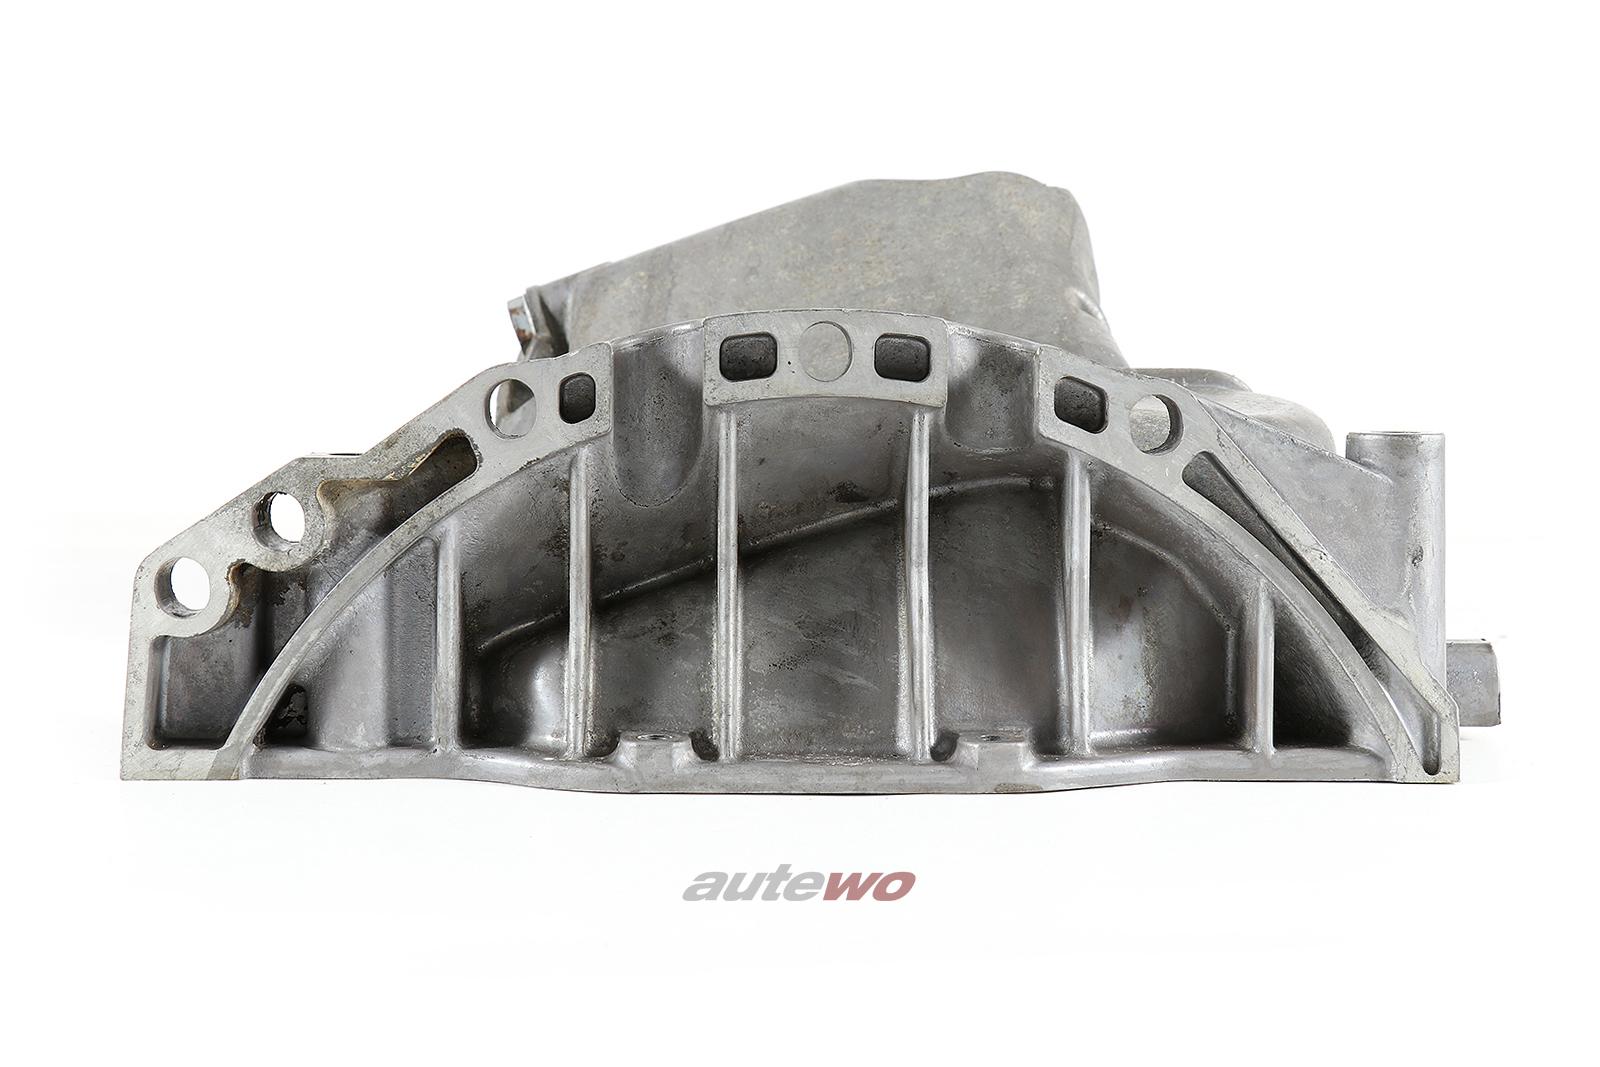 058103603B 058103598B Audi/VW A4 B5/A6 4B/Passat 1.8l Ölwanne Ölstandssensor